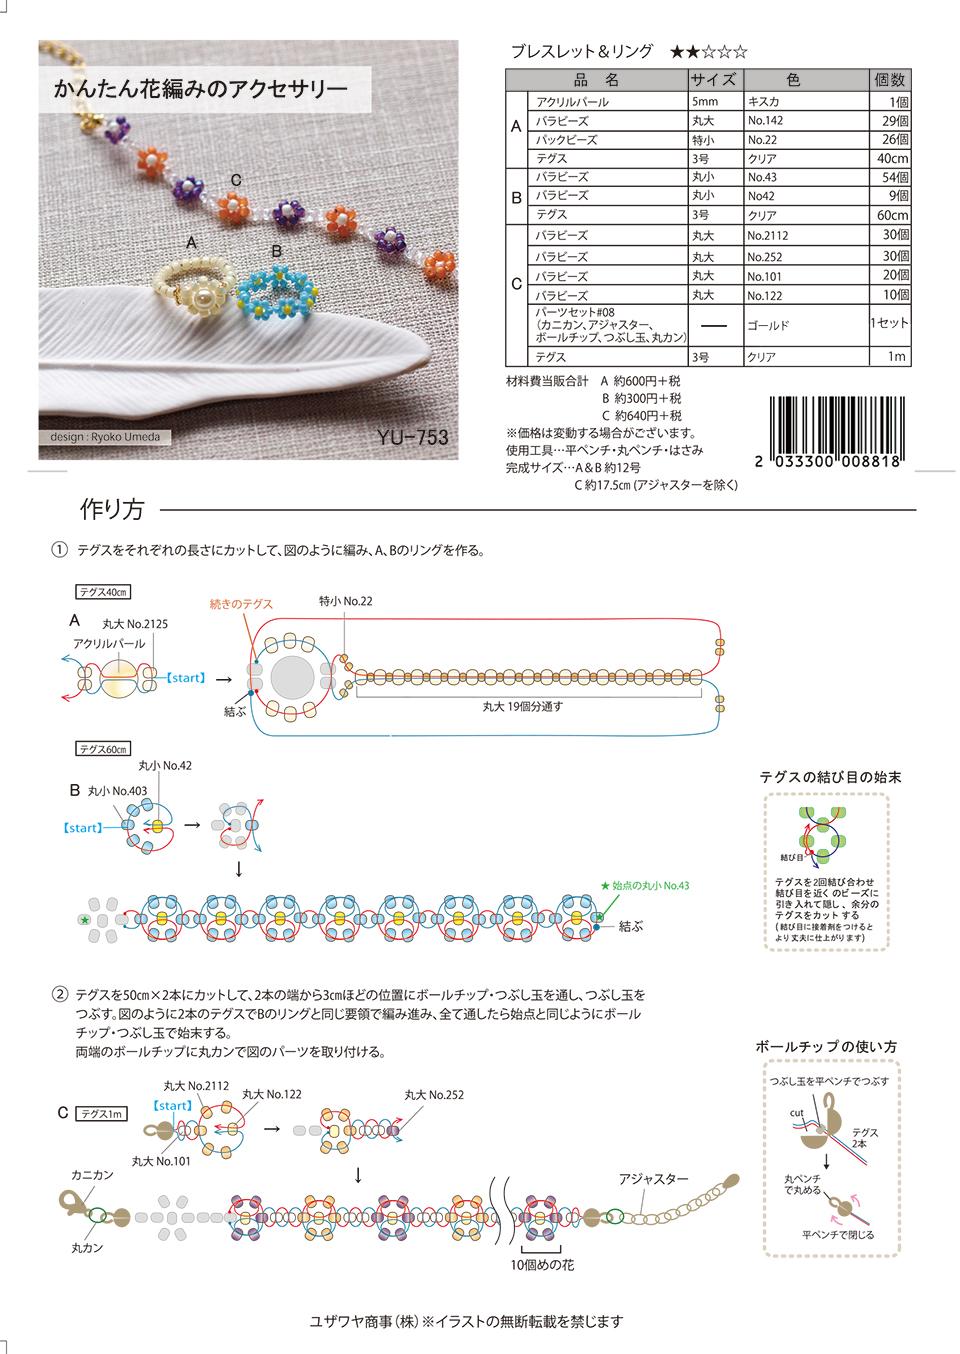 YU-753かんたん花編みのアクセサリー1.jpg